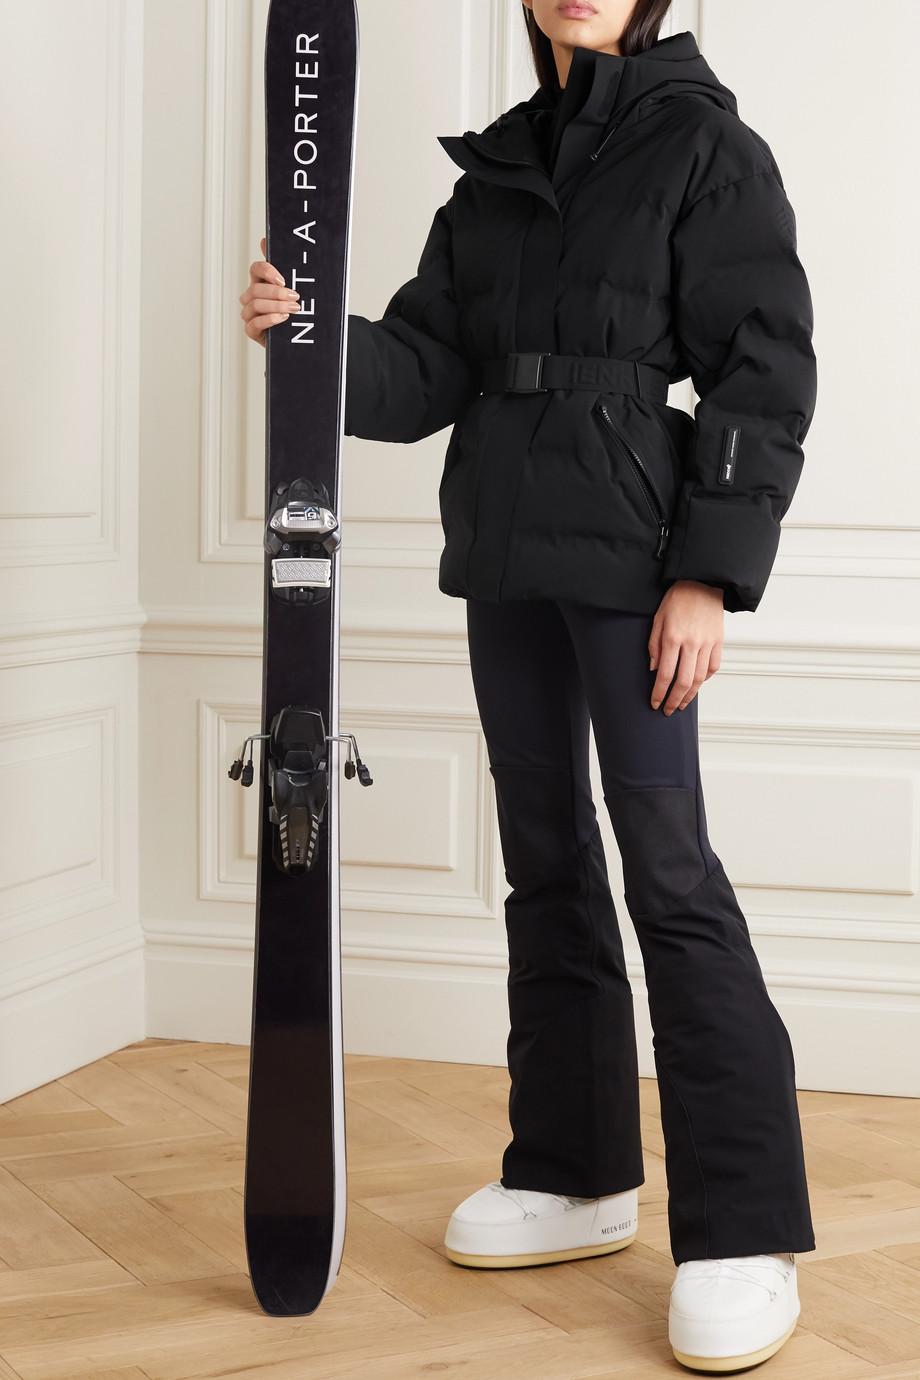 IENKI IENKI Sheena gesteppte Skijacke mit Daunenfüllung, Kapuze und Gürtel